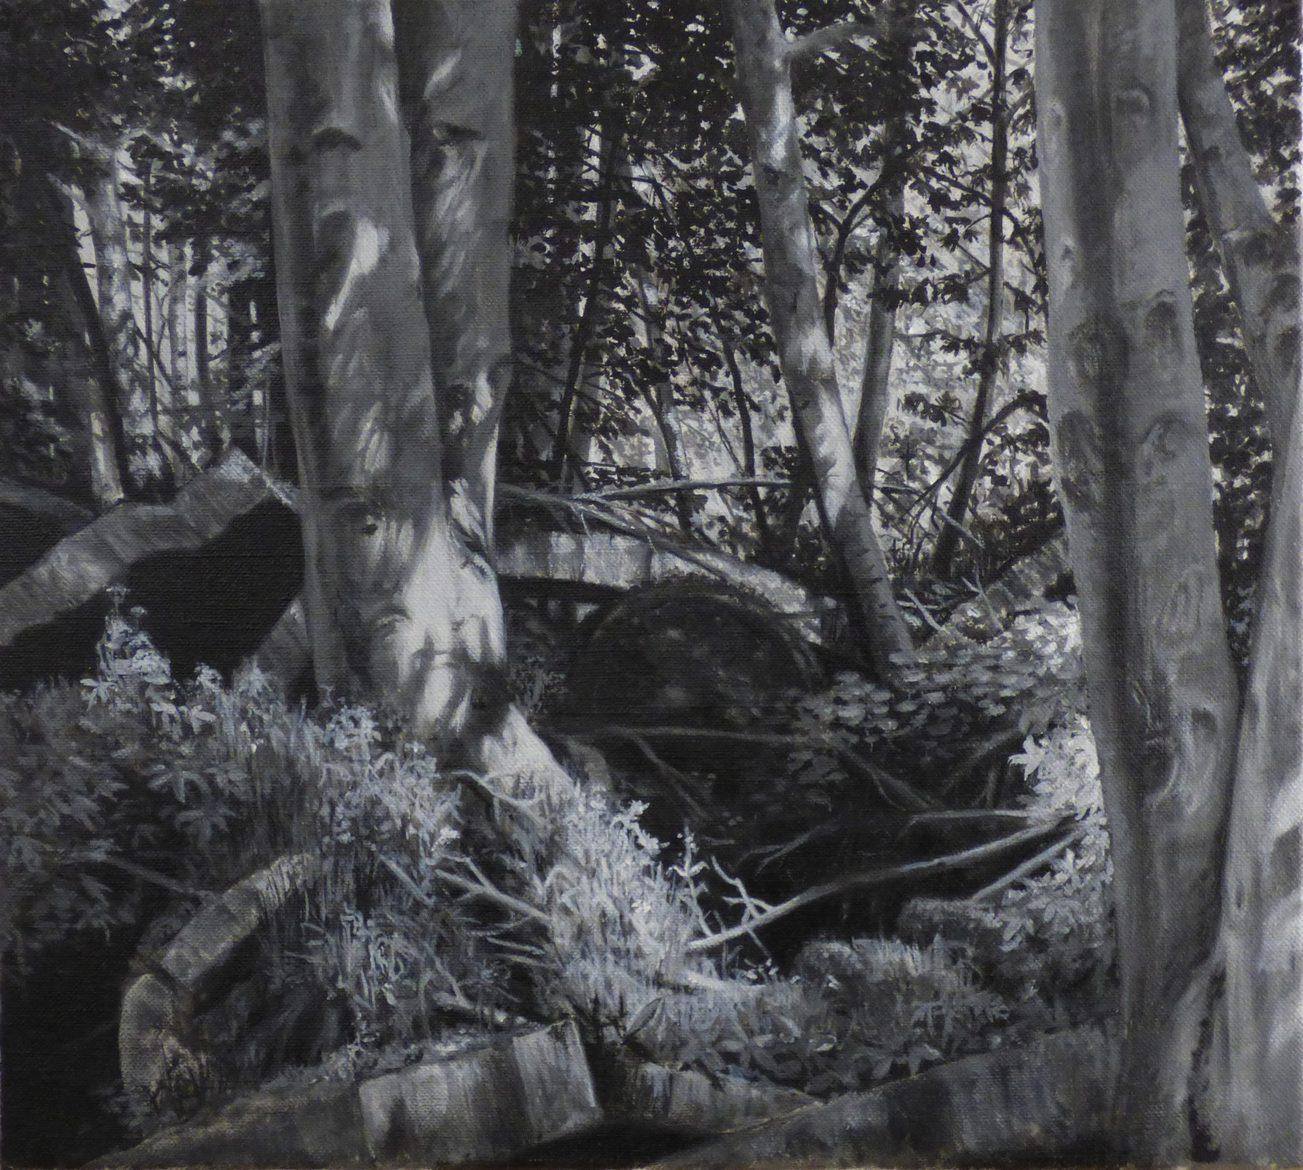 'Barth 1', 2018, 45 x 50 cm, oil on canvas